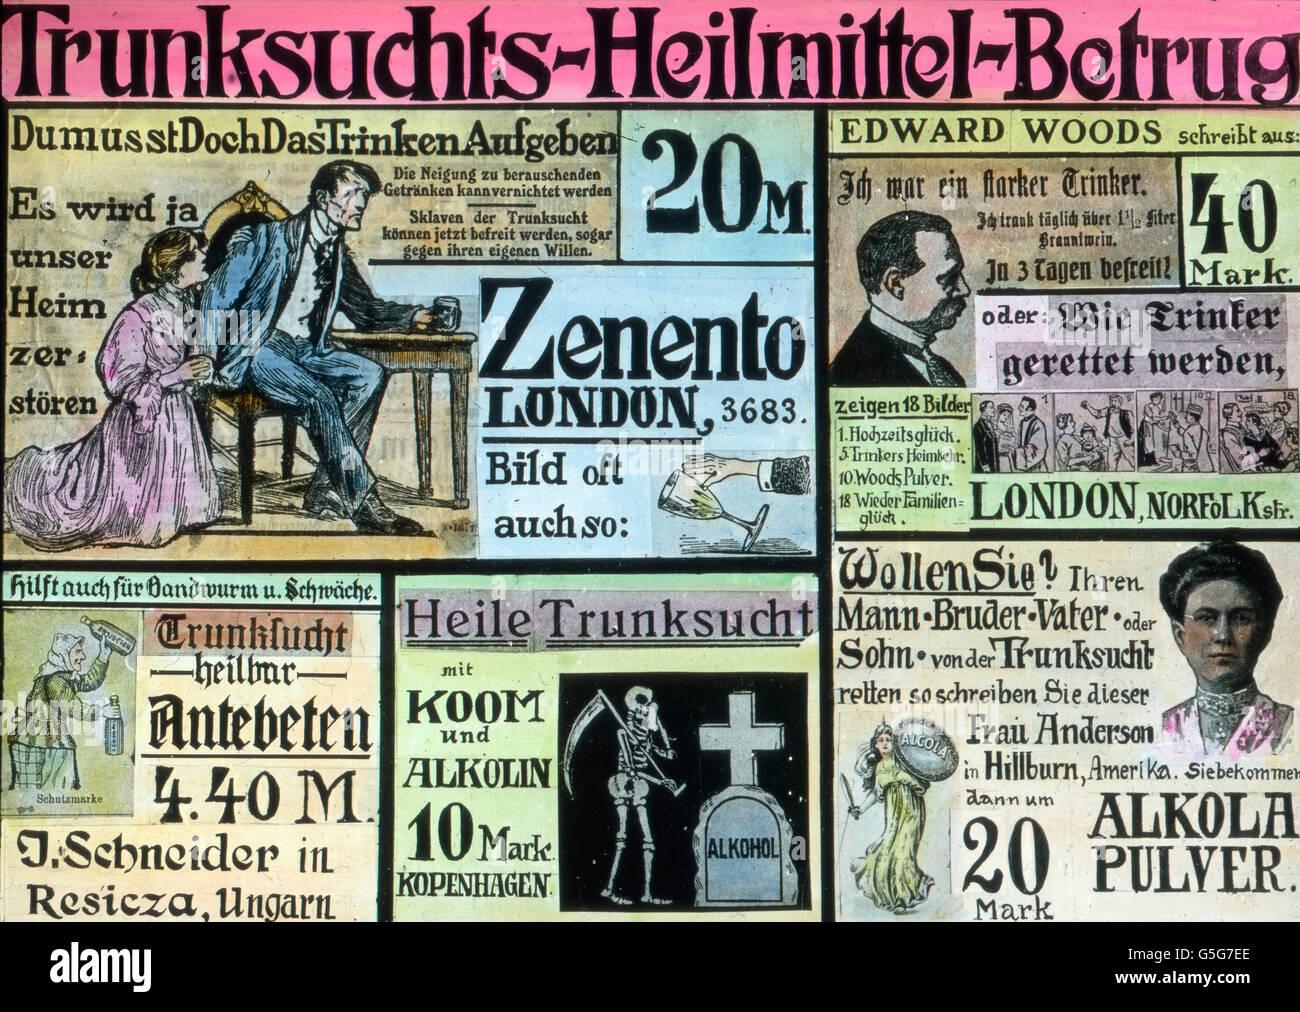 Betrügerische Zeitungsanzeigen zur Heilung des Alkoholismus. Deceitful newspaper advertisements for healing - Stock Image